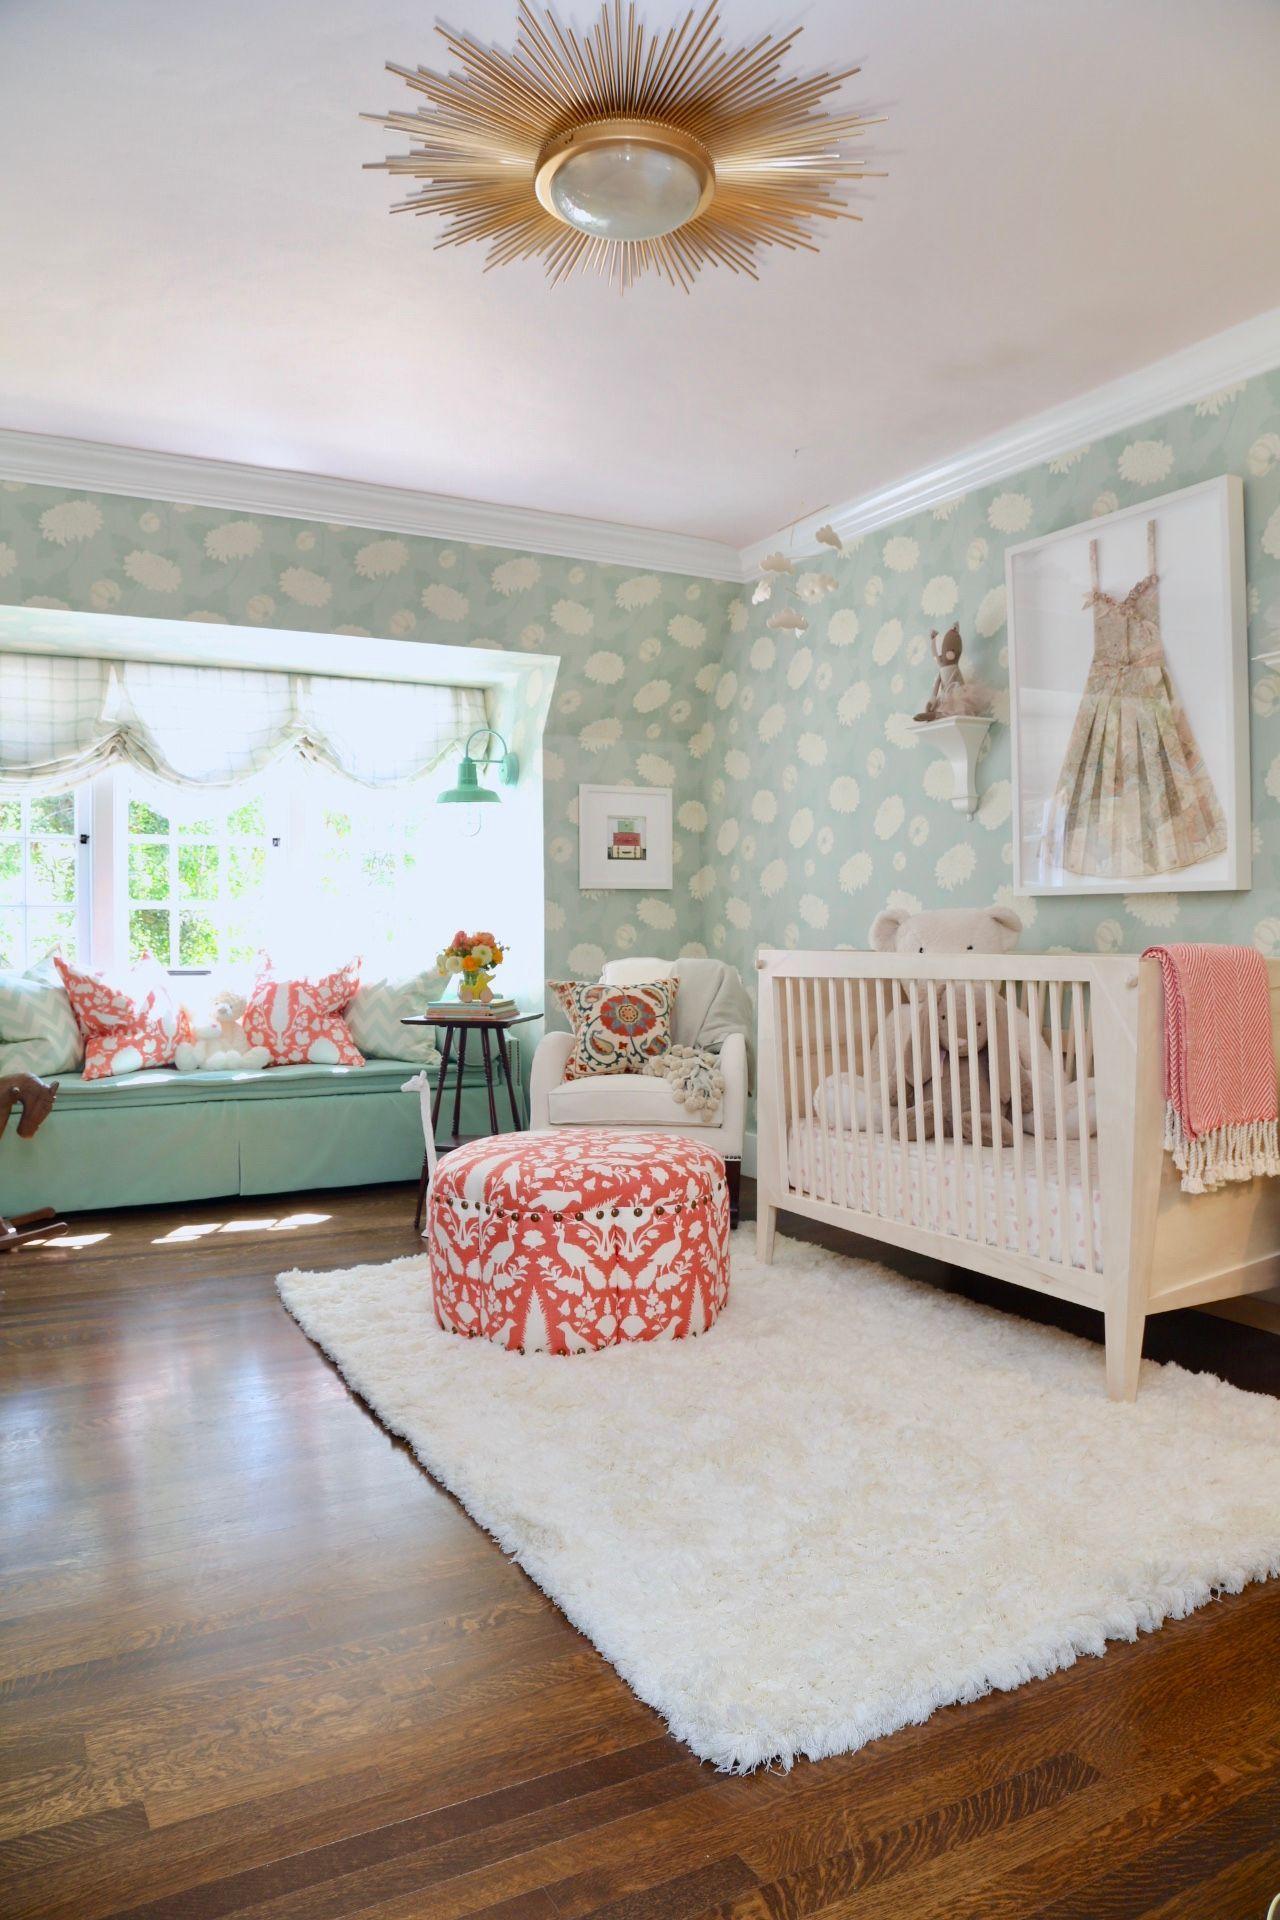 440 Children S Room Lighting Ideas In 2021 Favorite Lighting Project Nursery Room Accessories